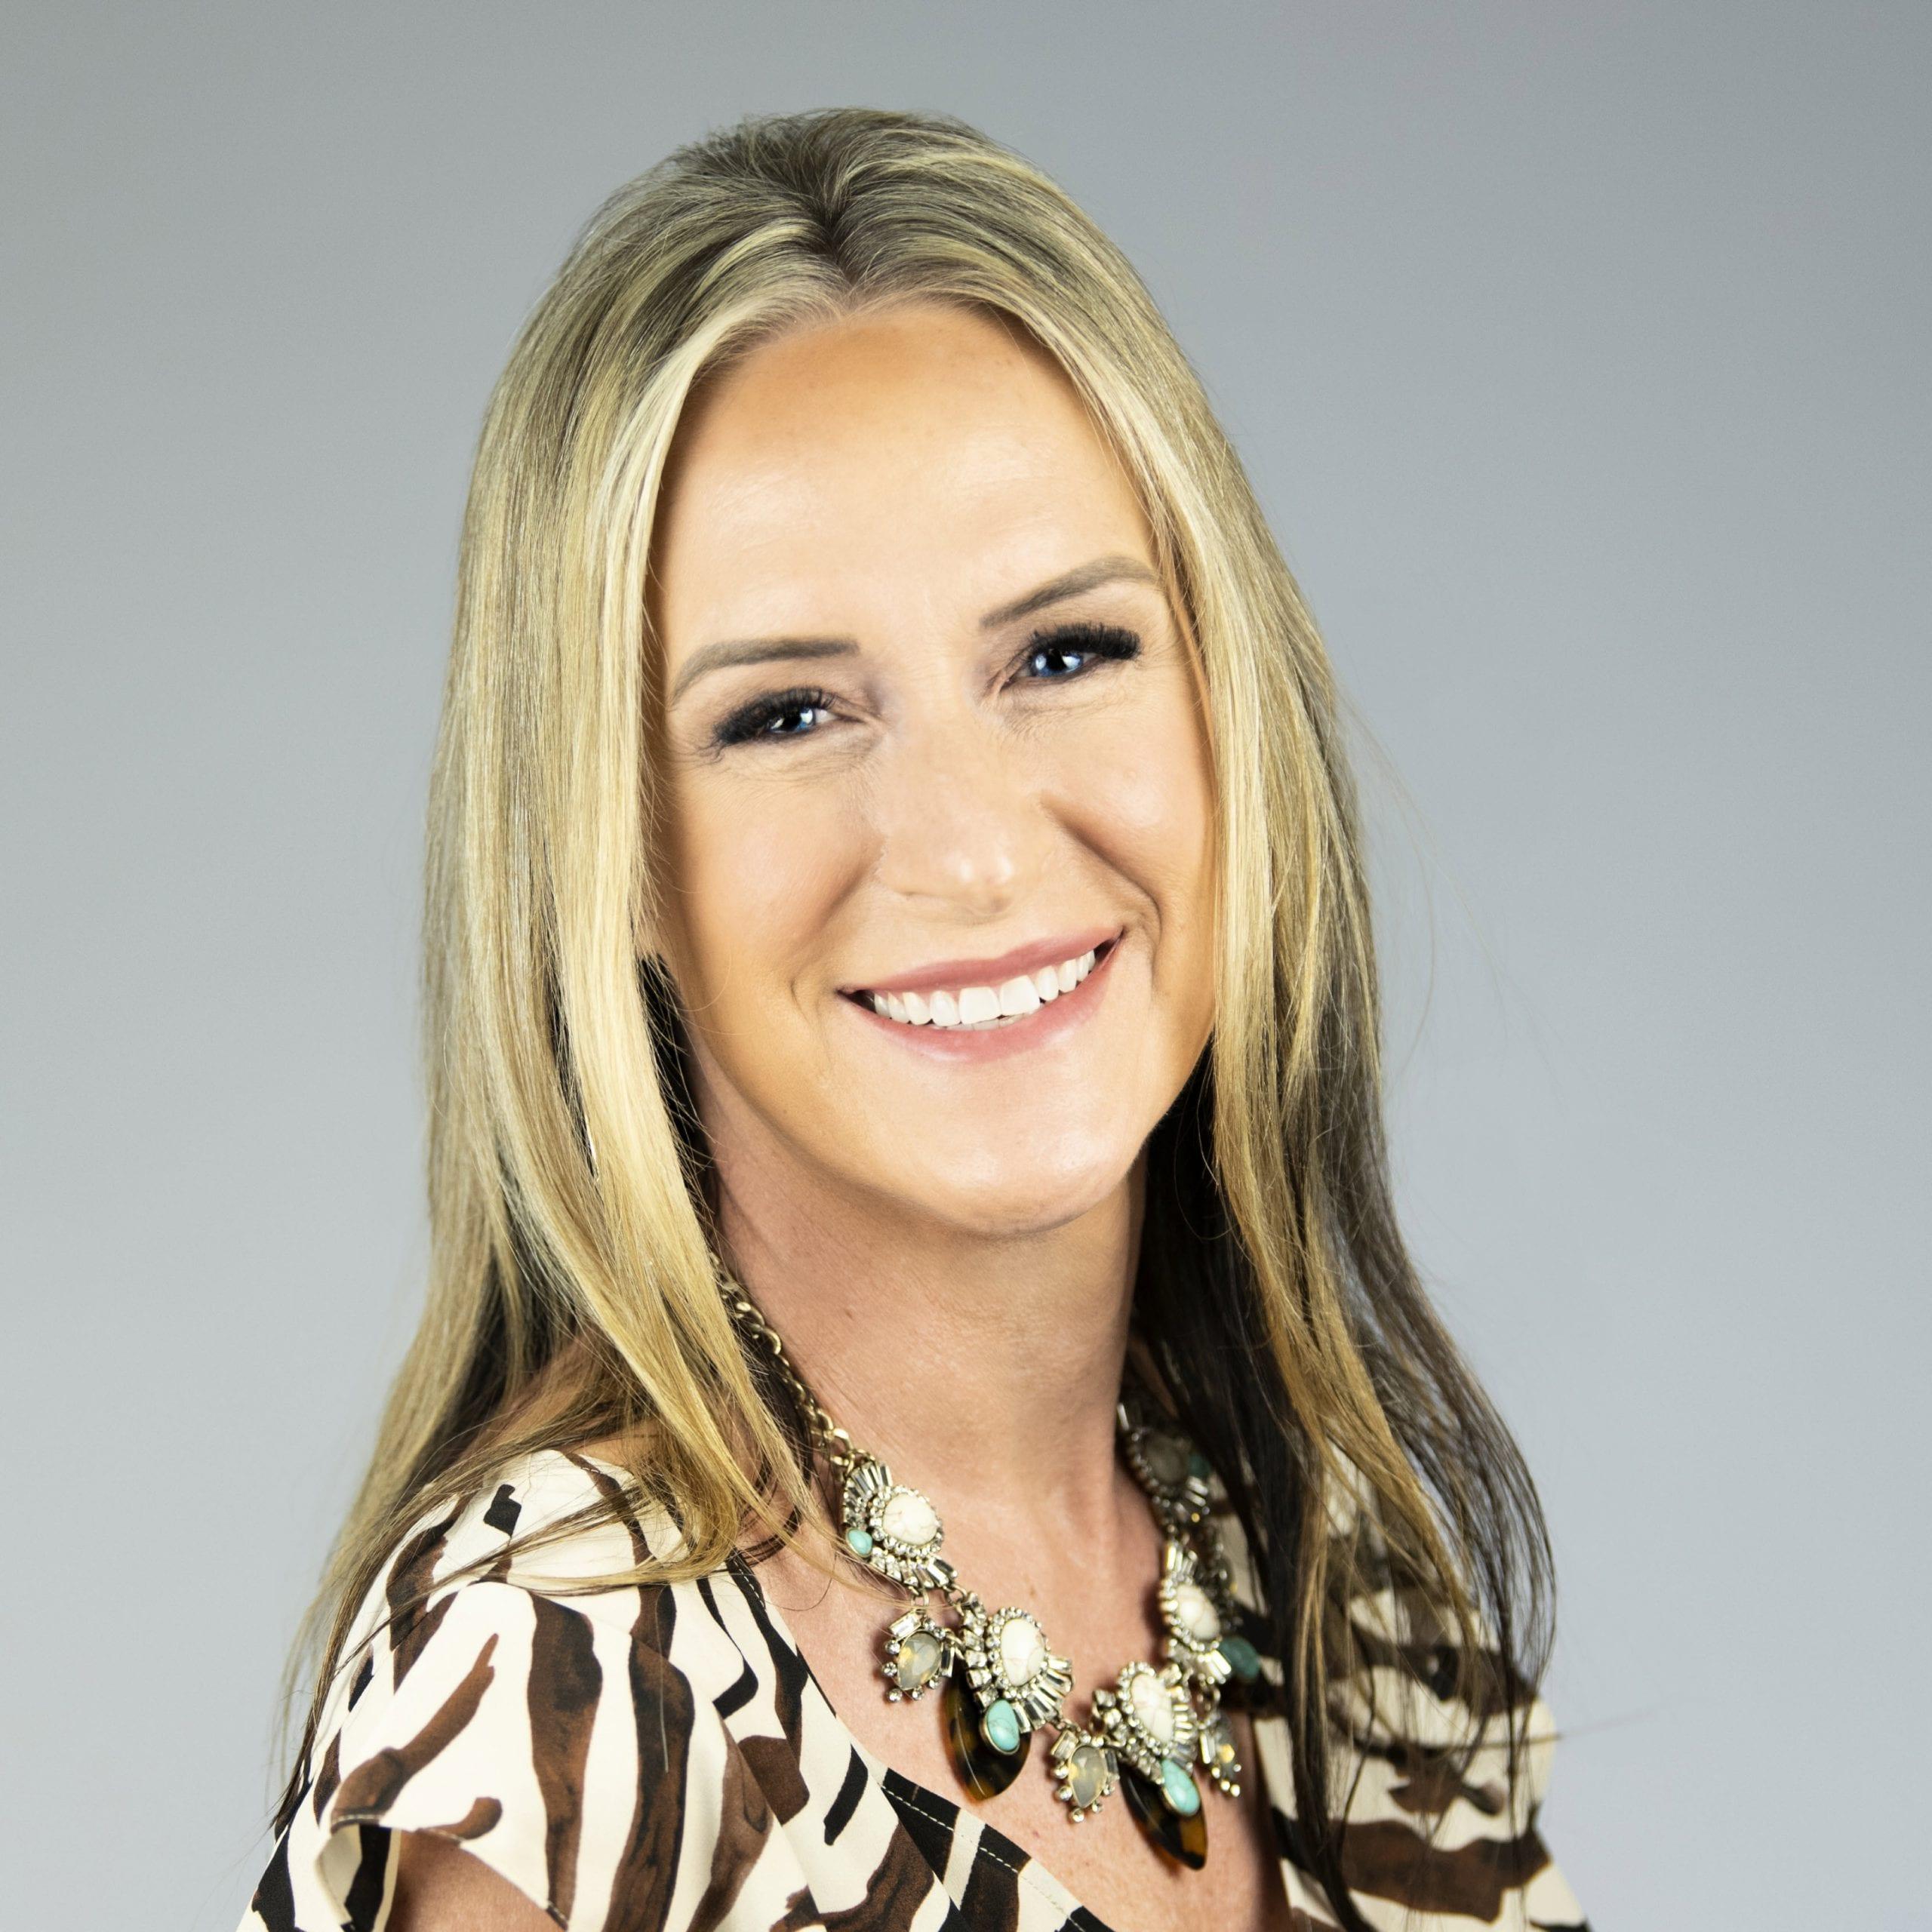 Stacey Melton